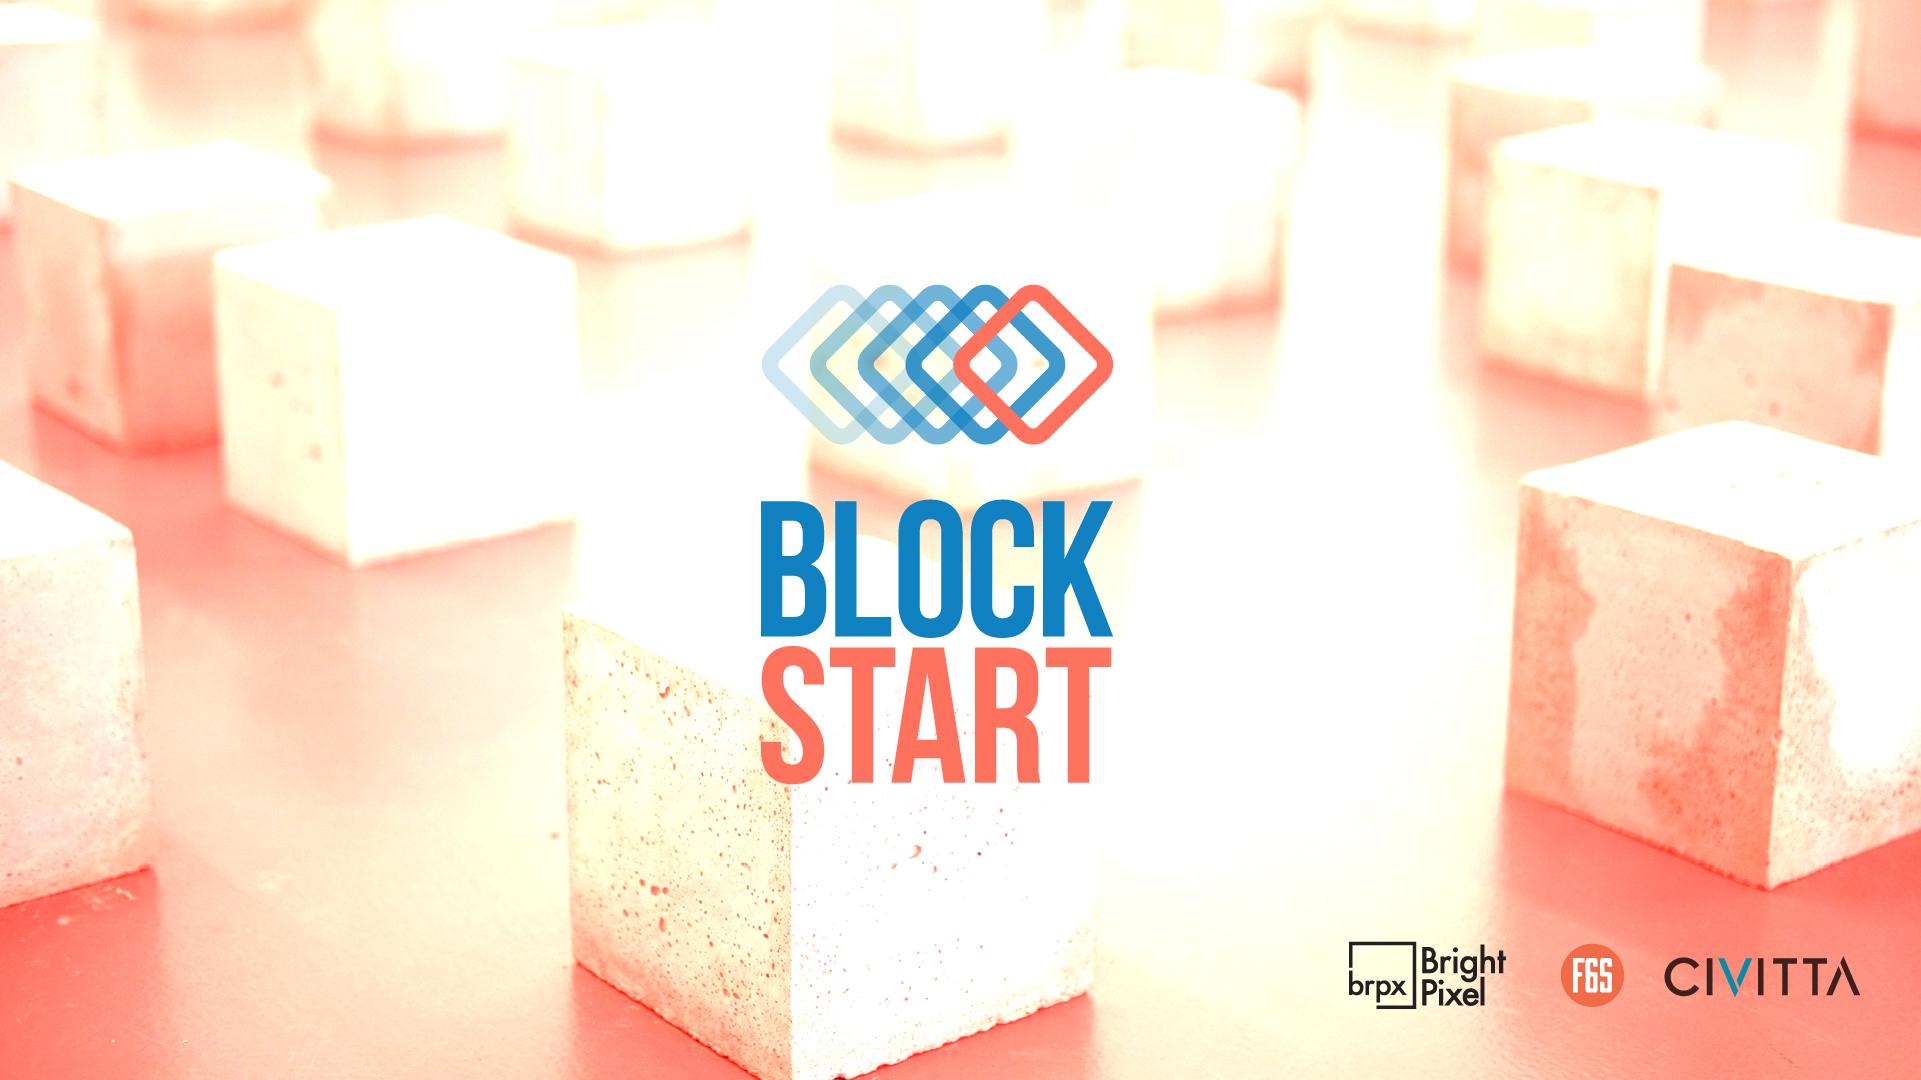 BlockStart image with partners logos(1)